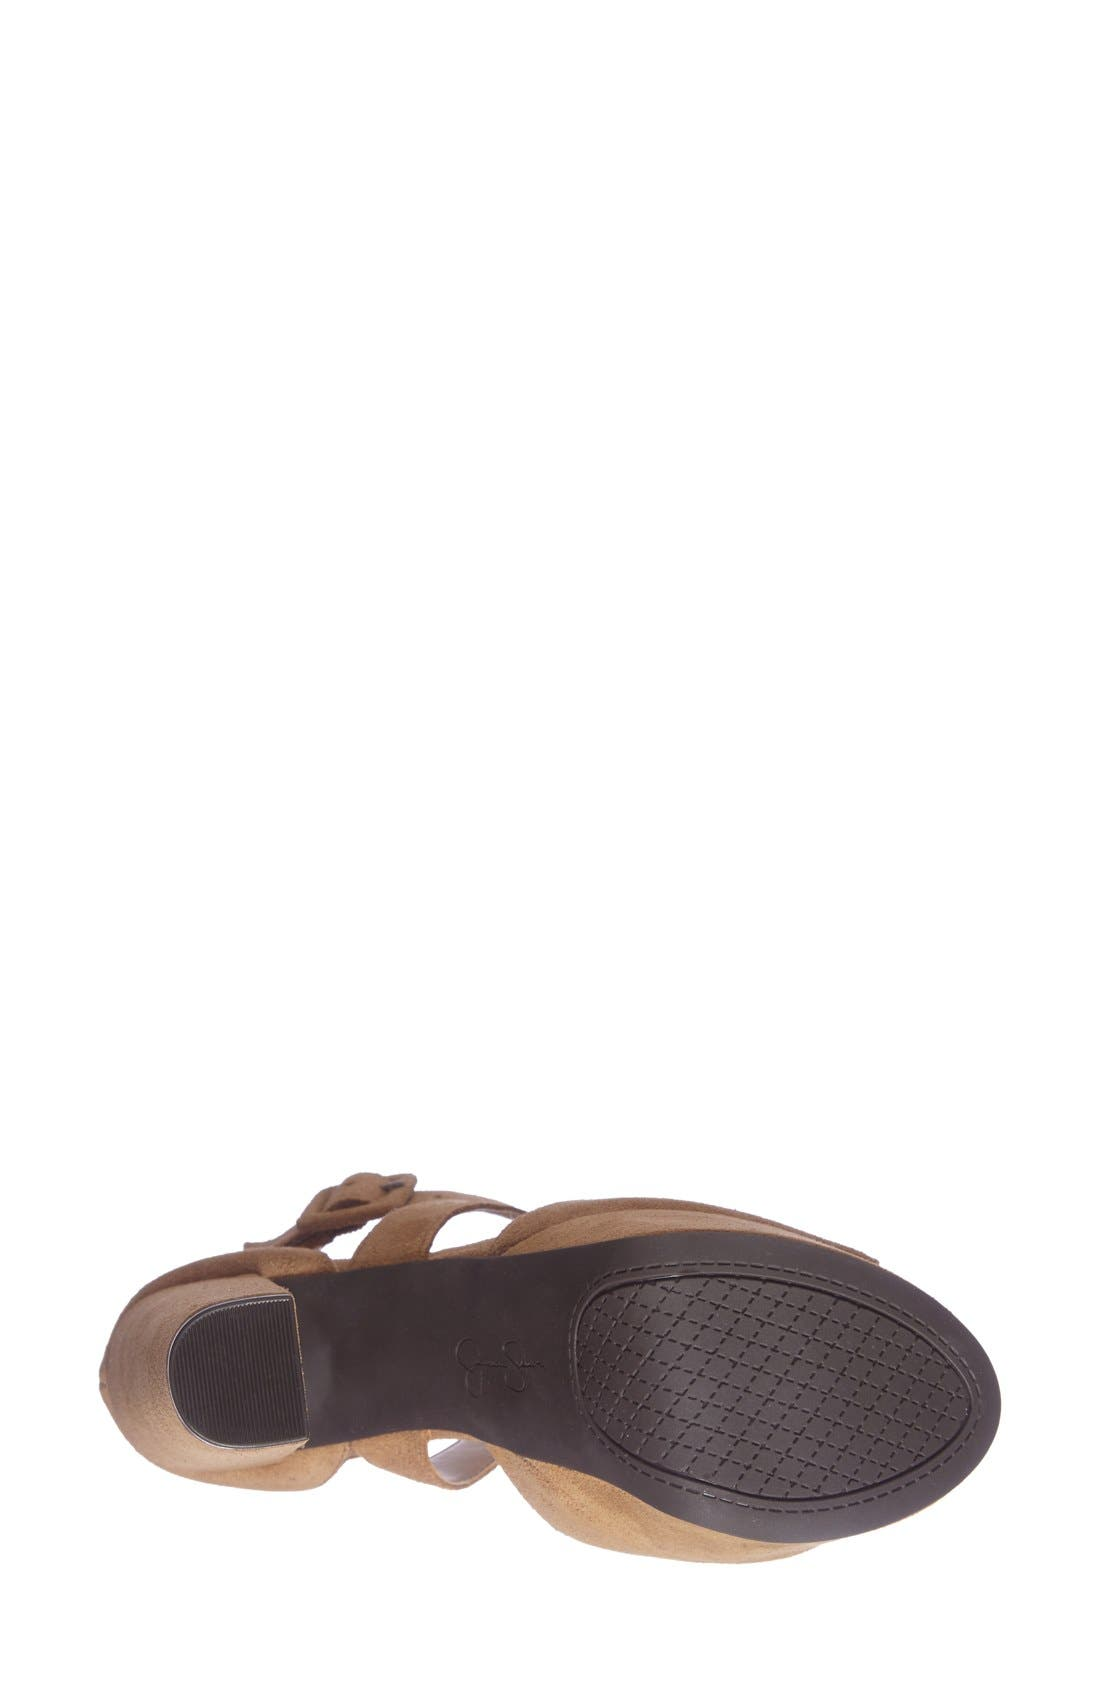 Alternate Image 4  - Jessica Simpson 'Derian' Platform Sandal (Women)